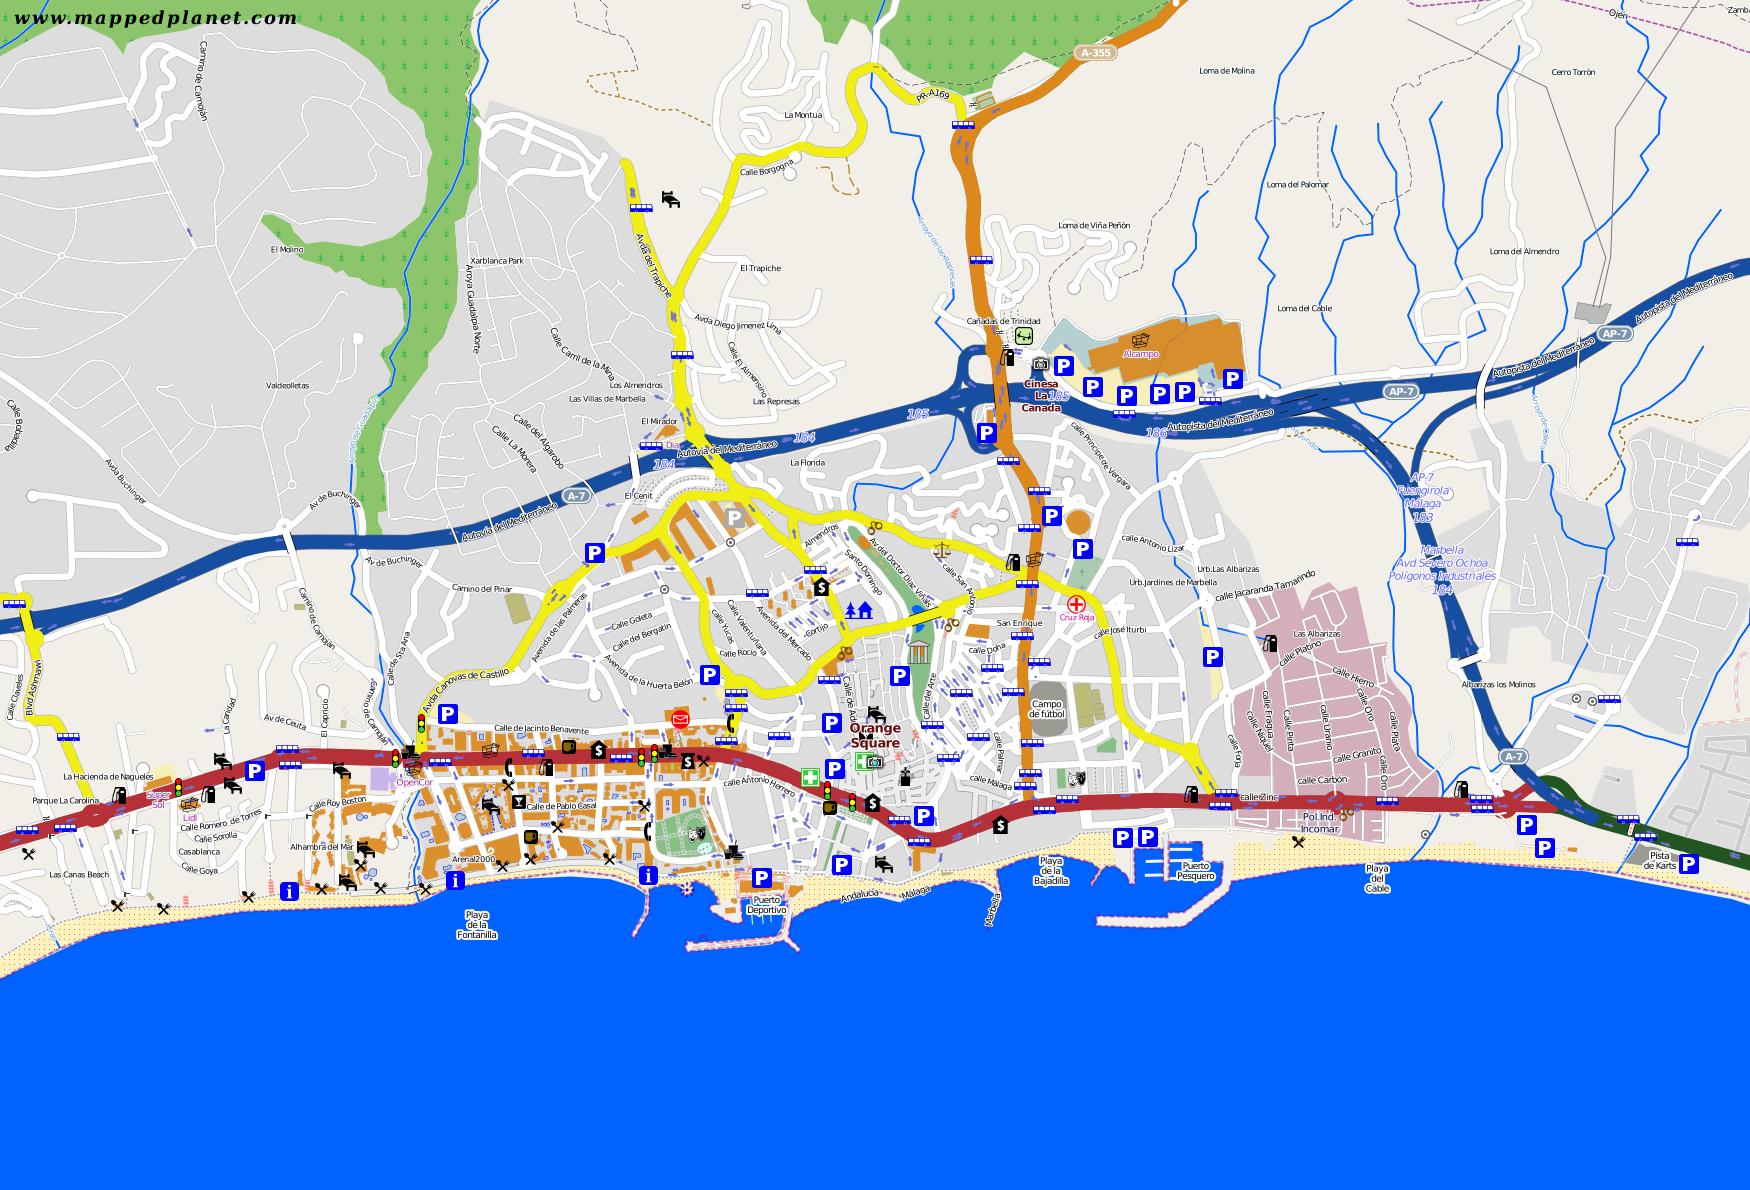 Map Marbella My blog